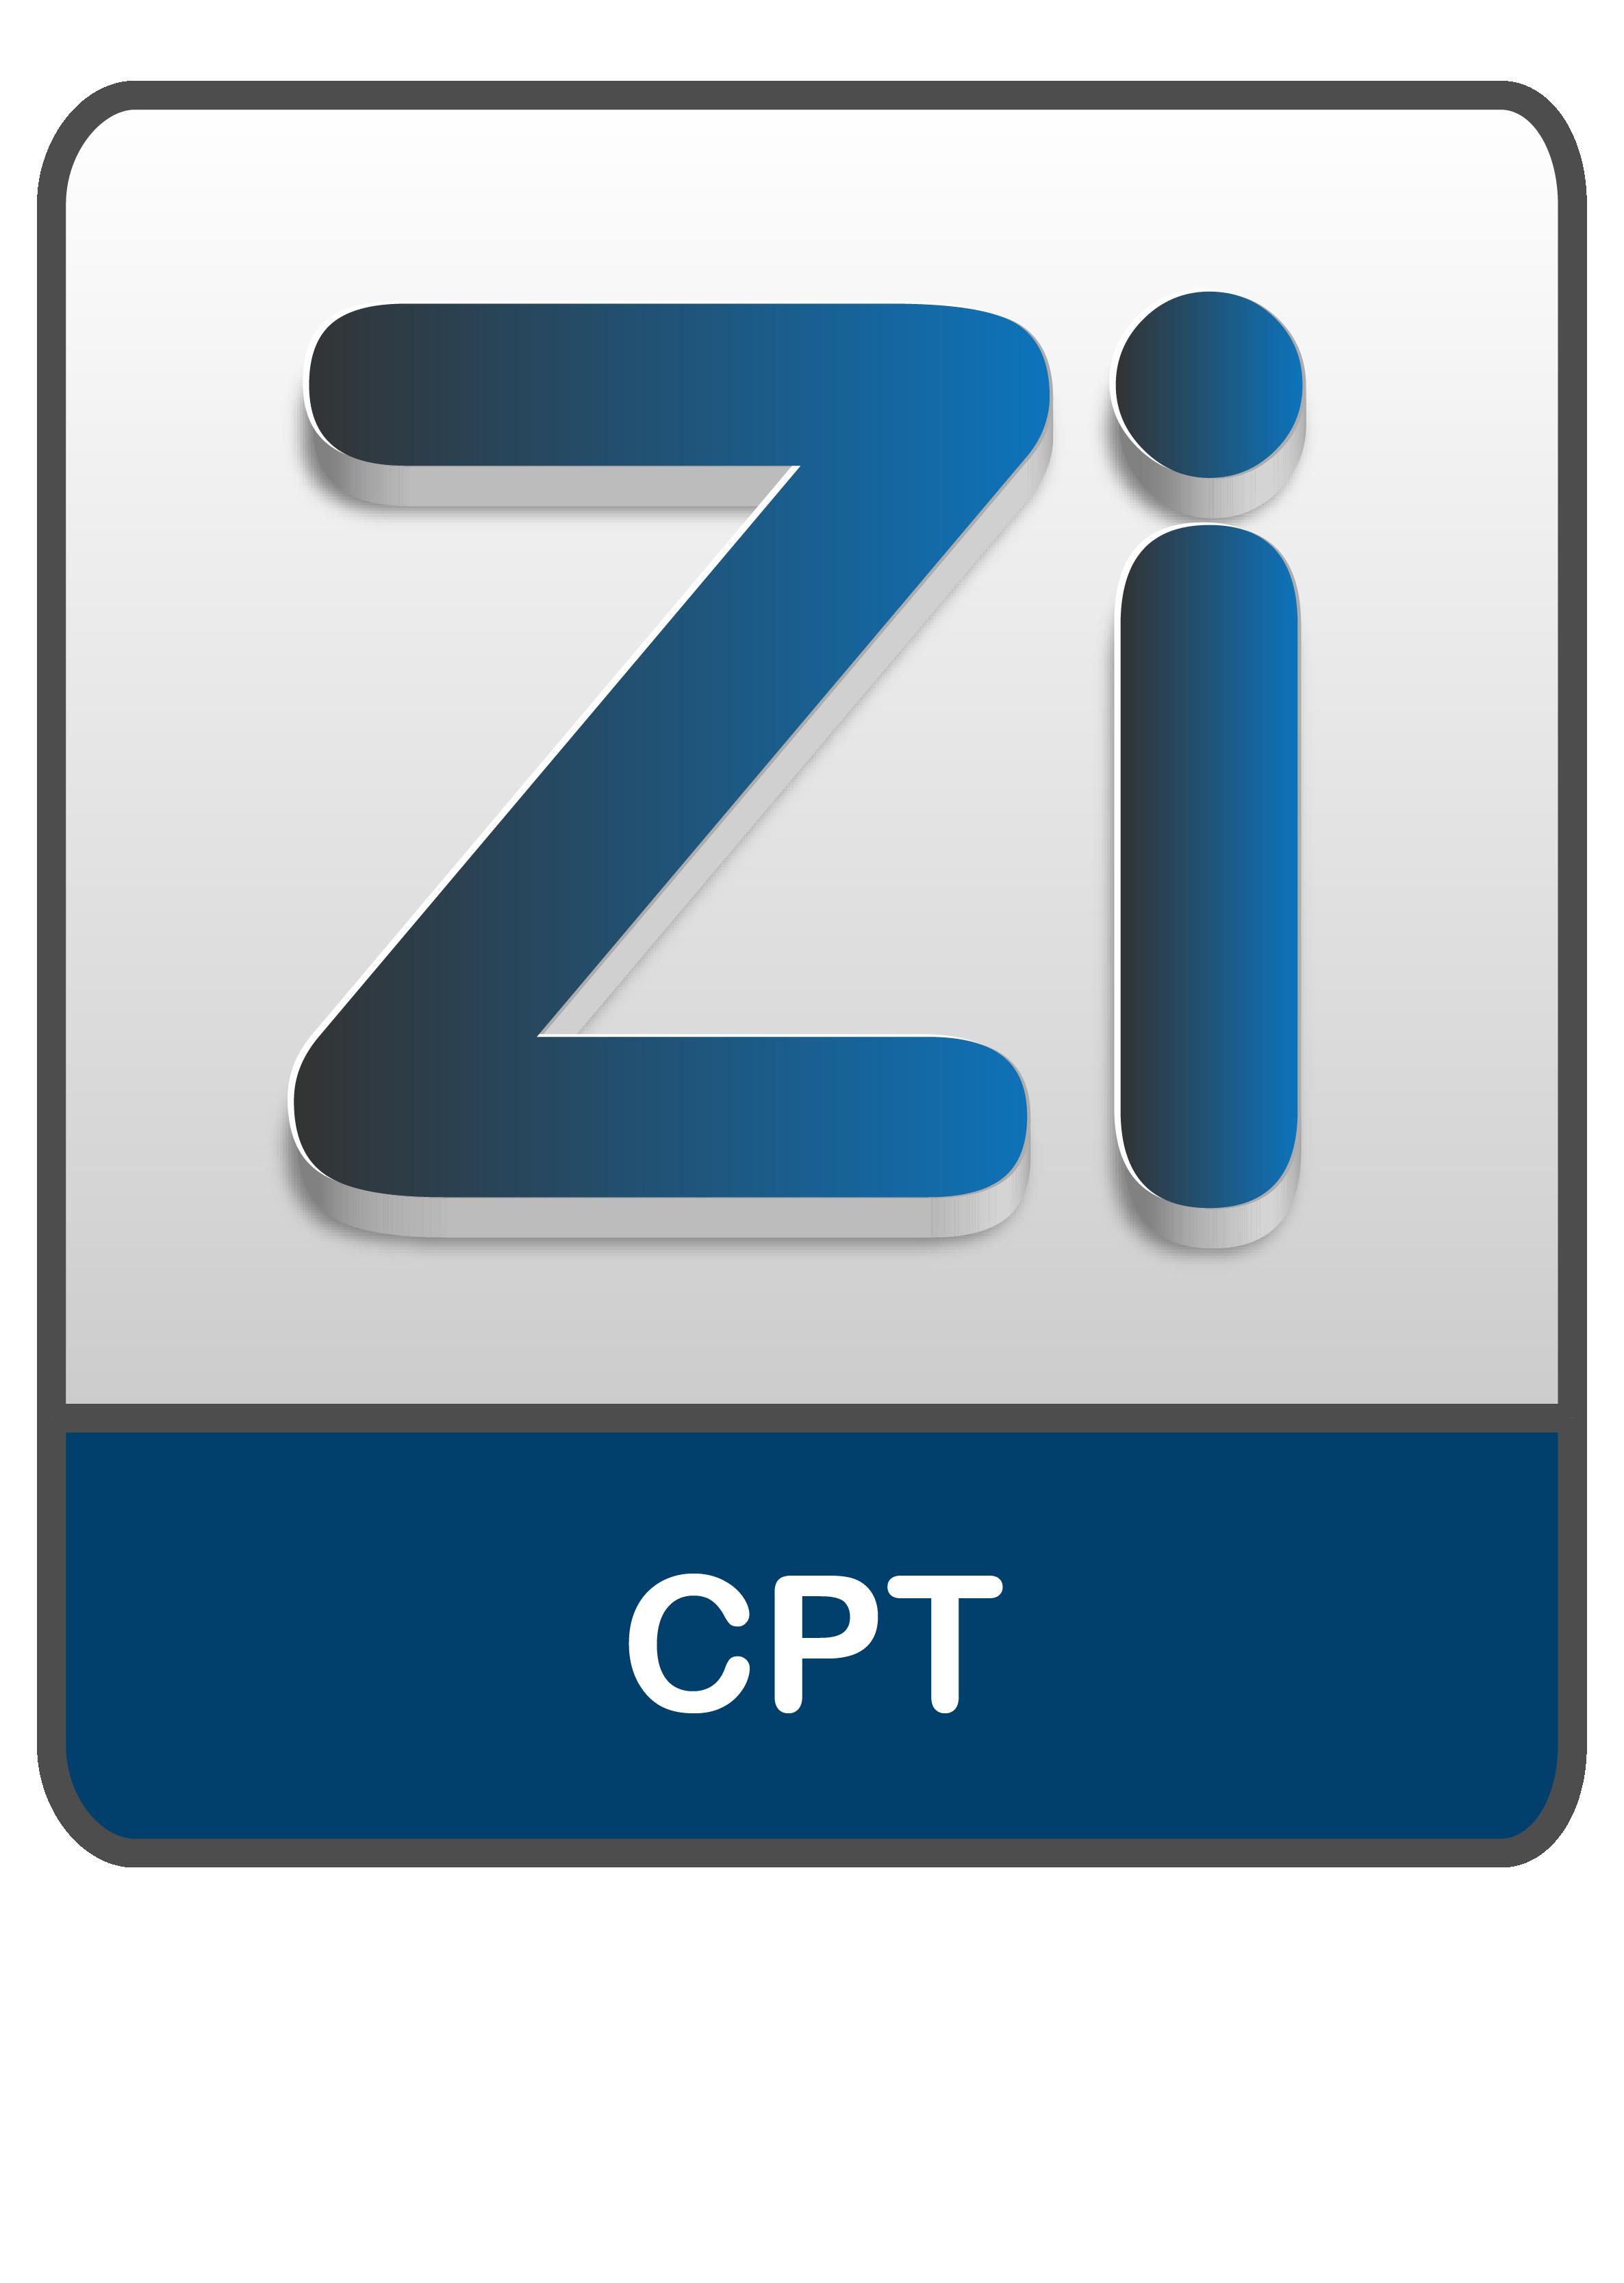 Peri-Peri-Creative-zipcord-industries-logo2017_Zipcord-CPT